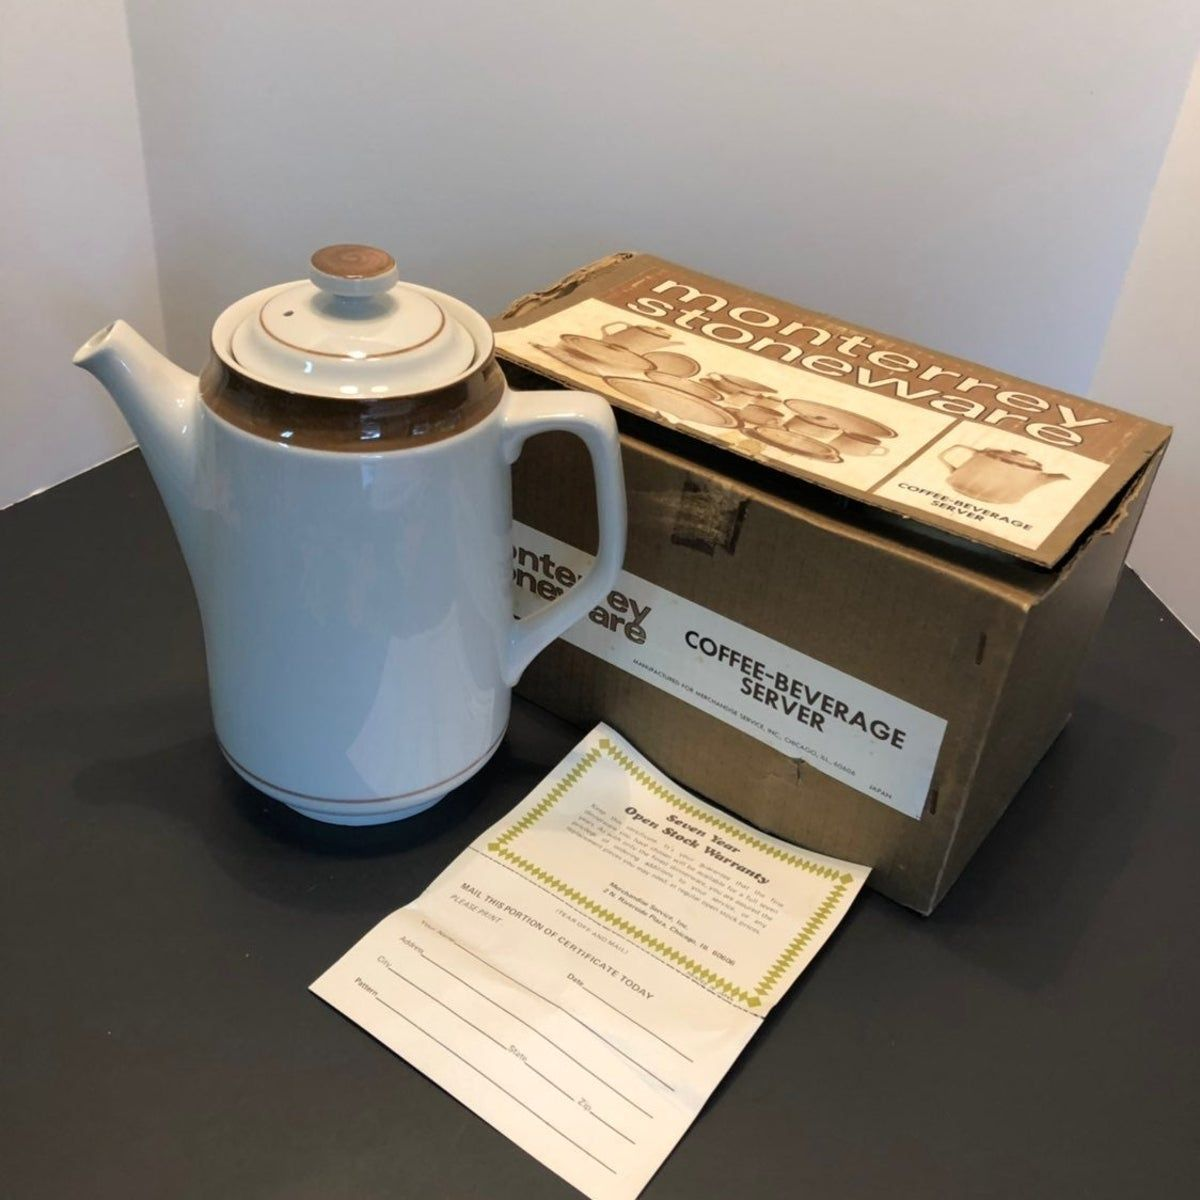 VTG Monterrey Stoneware Coffee Server #coffeeserver VTG Monterrey Stoneware Coffee Server #coffeeserver